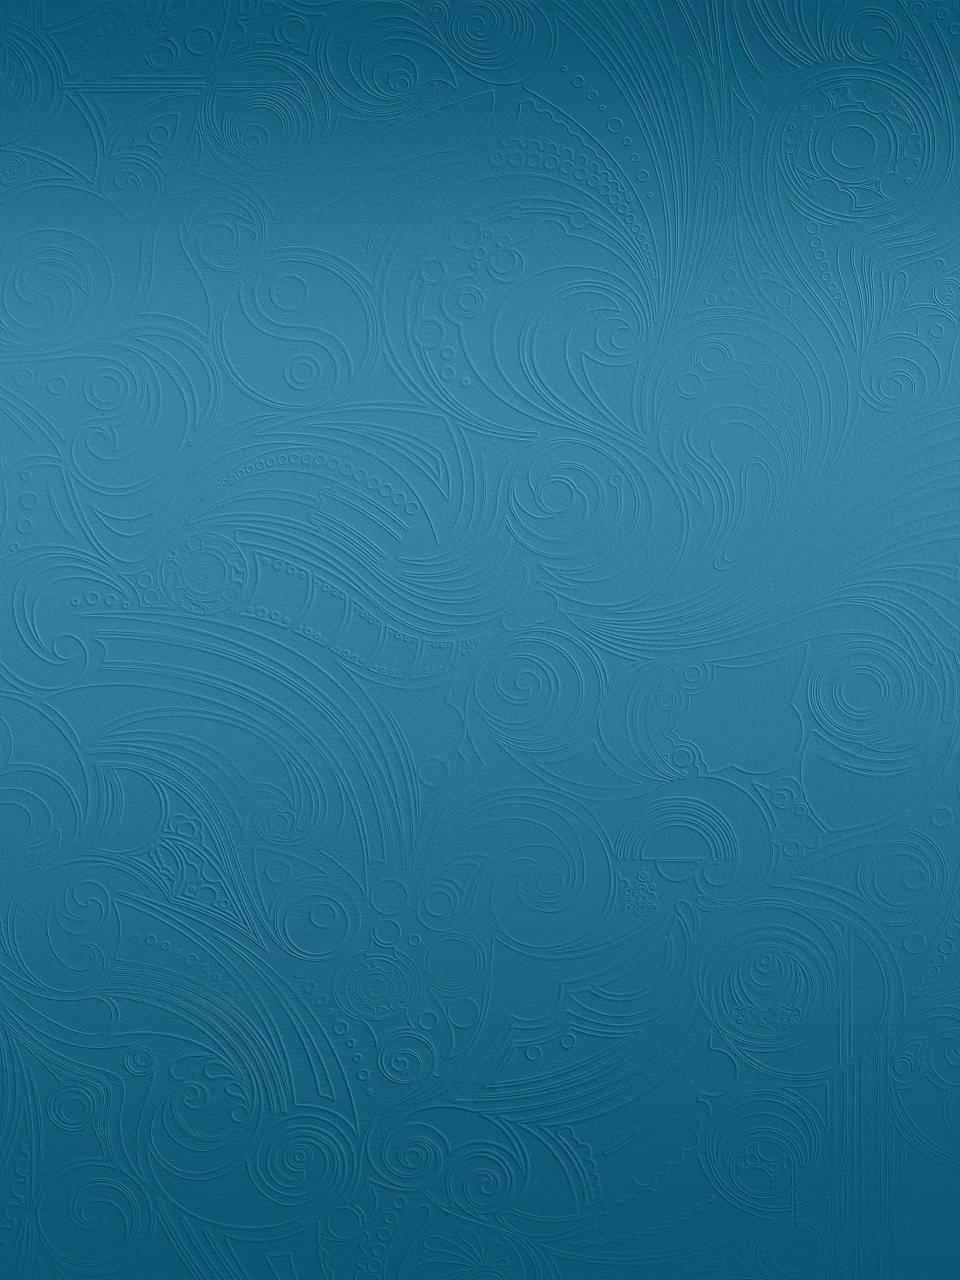 Basic 3d Pattern S7 Wallpaper By Druffix2 14 Free On Zedge